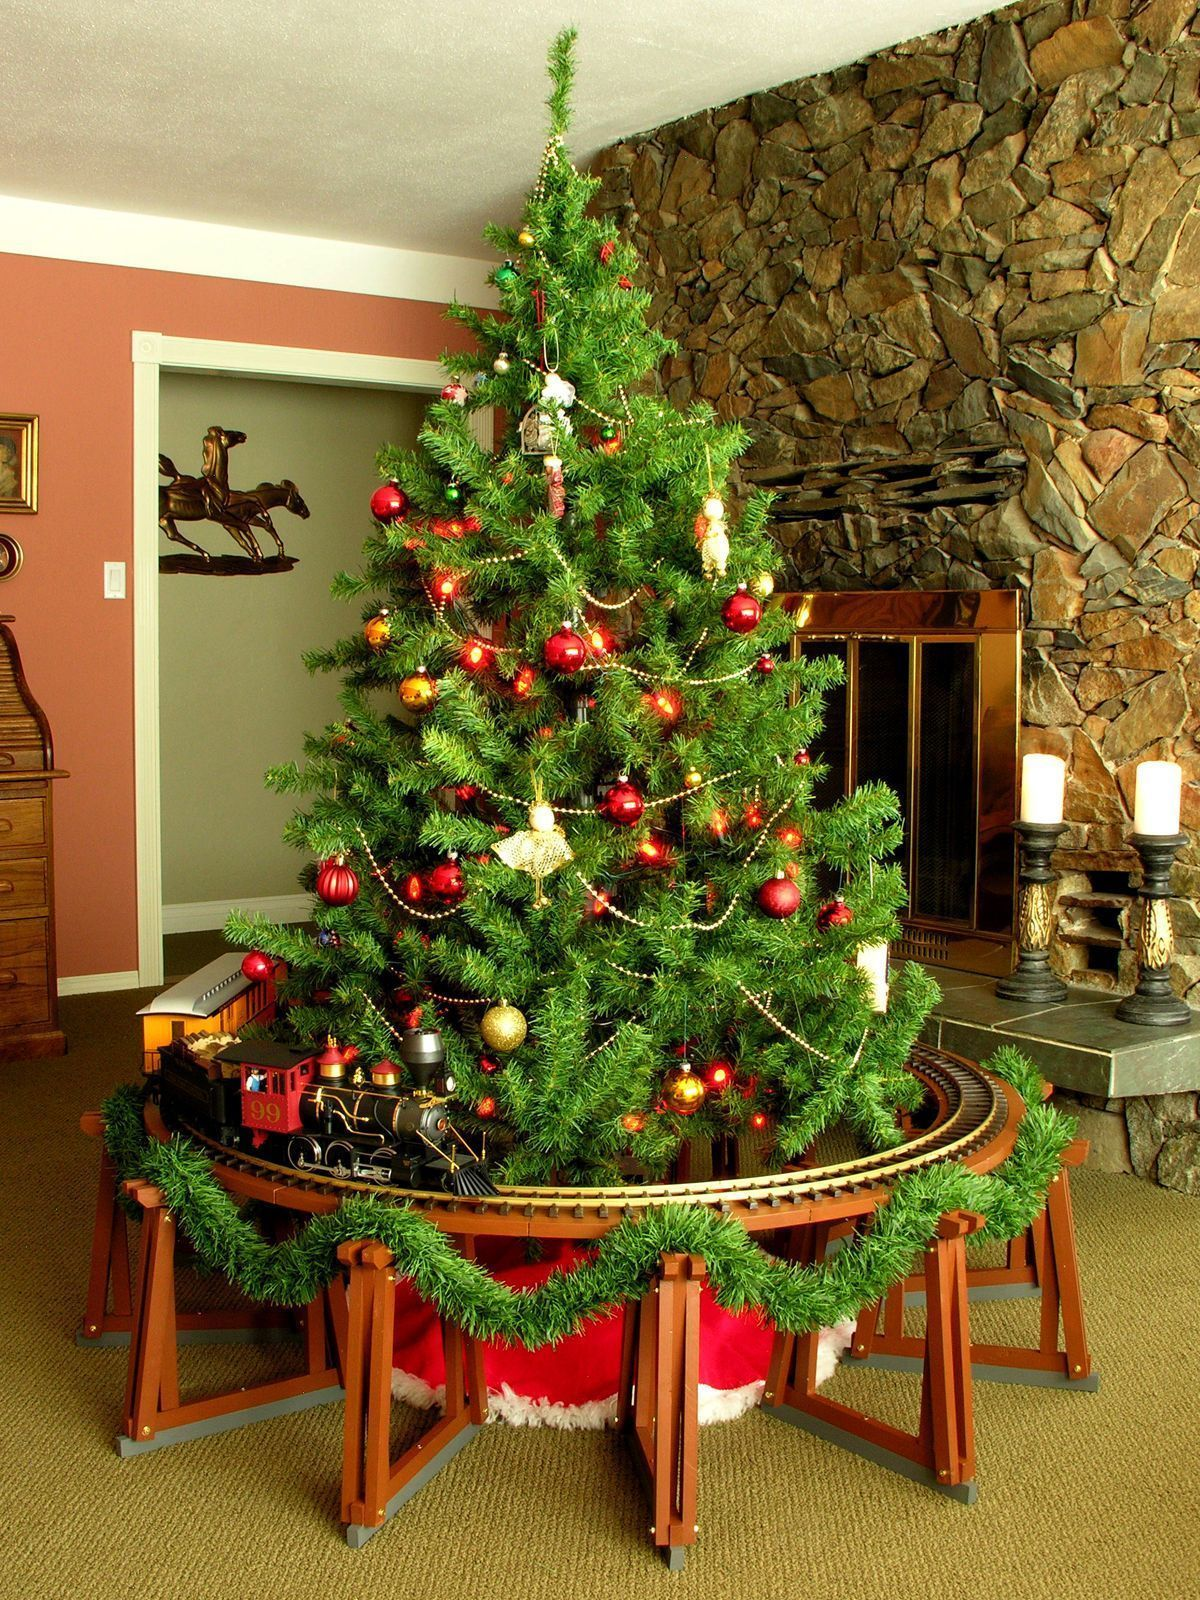 Christmas Tree Model Train Trestle Set - for 4 Foot Tracks - G Scale ...